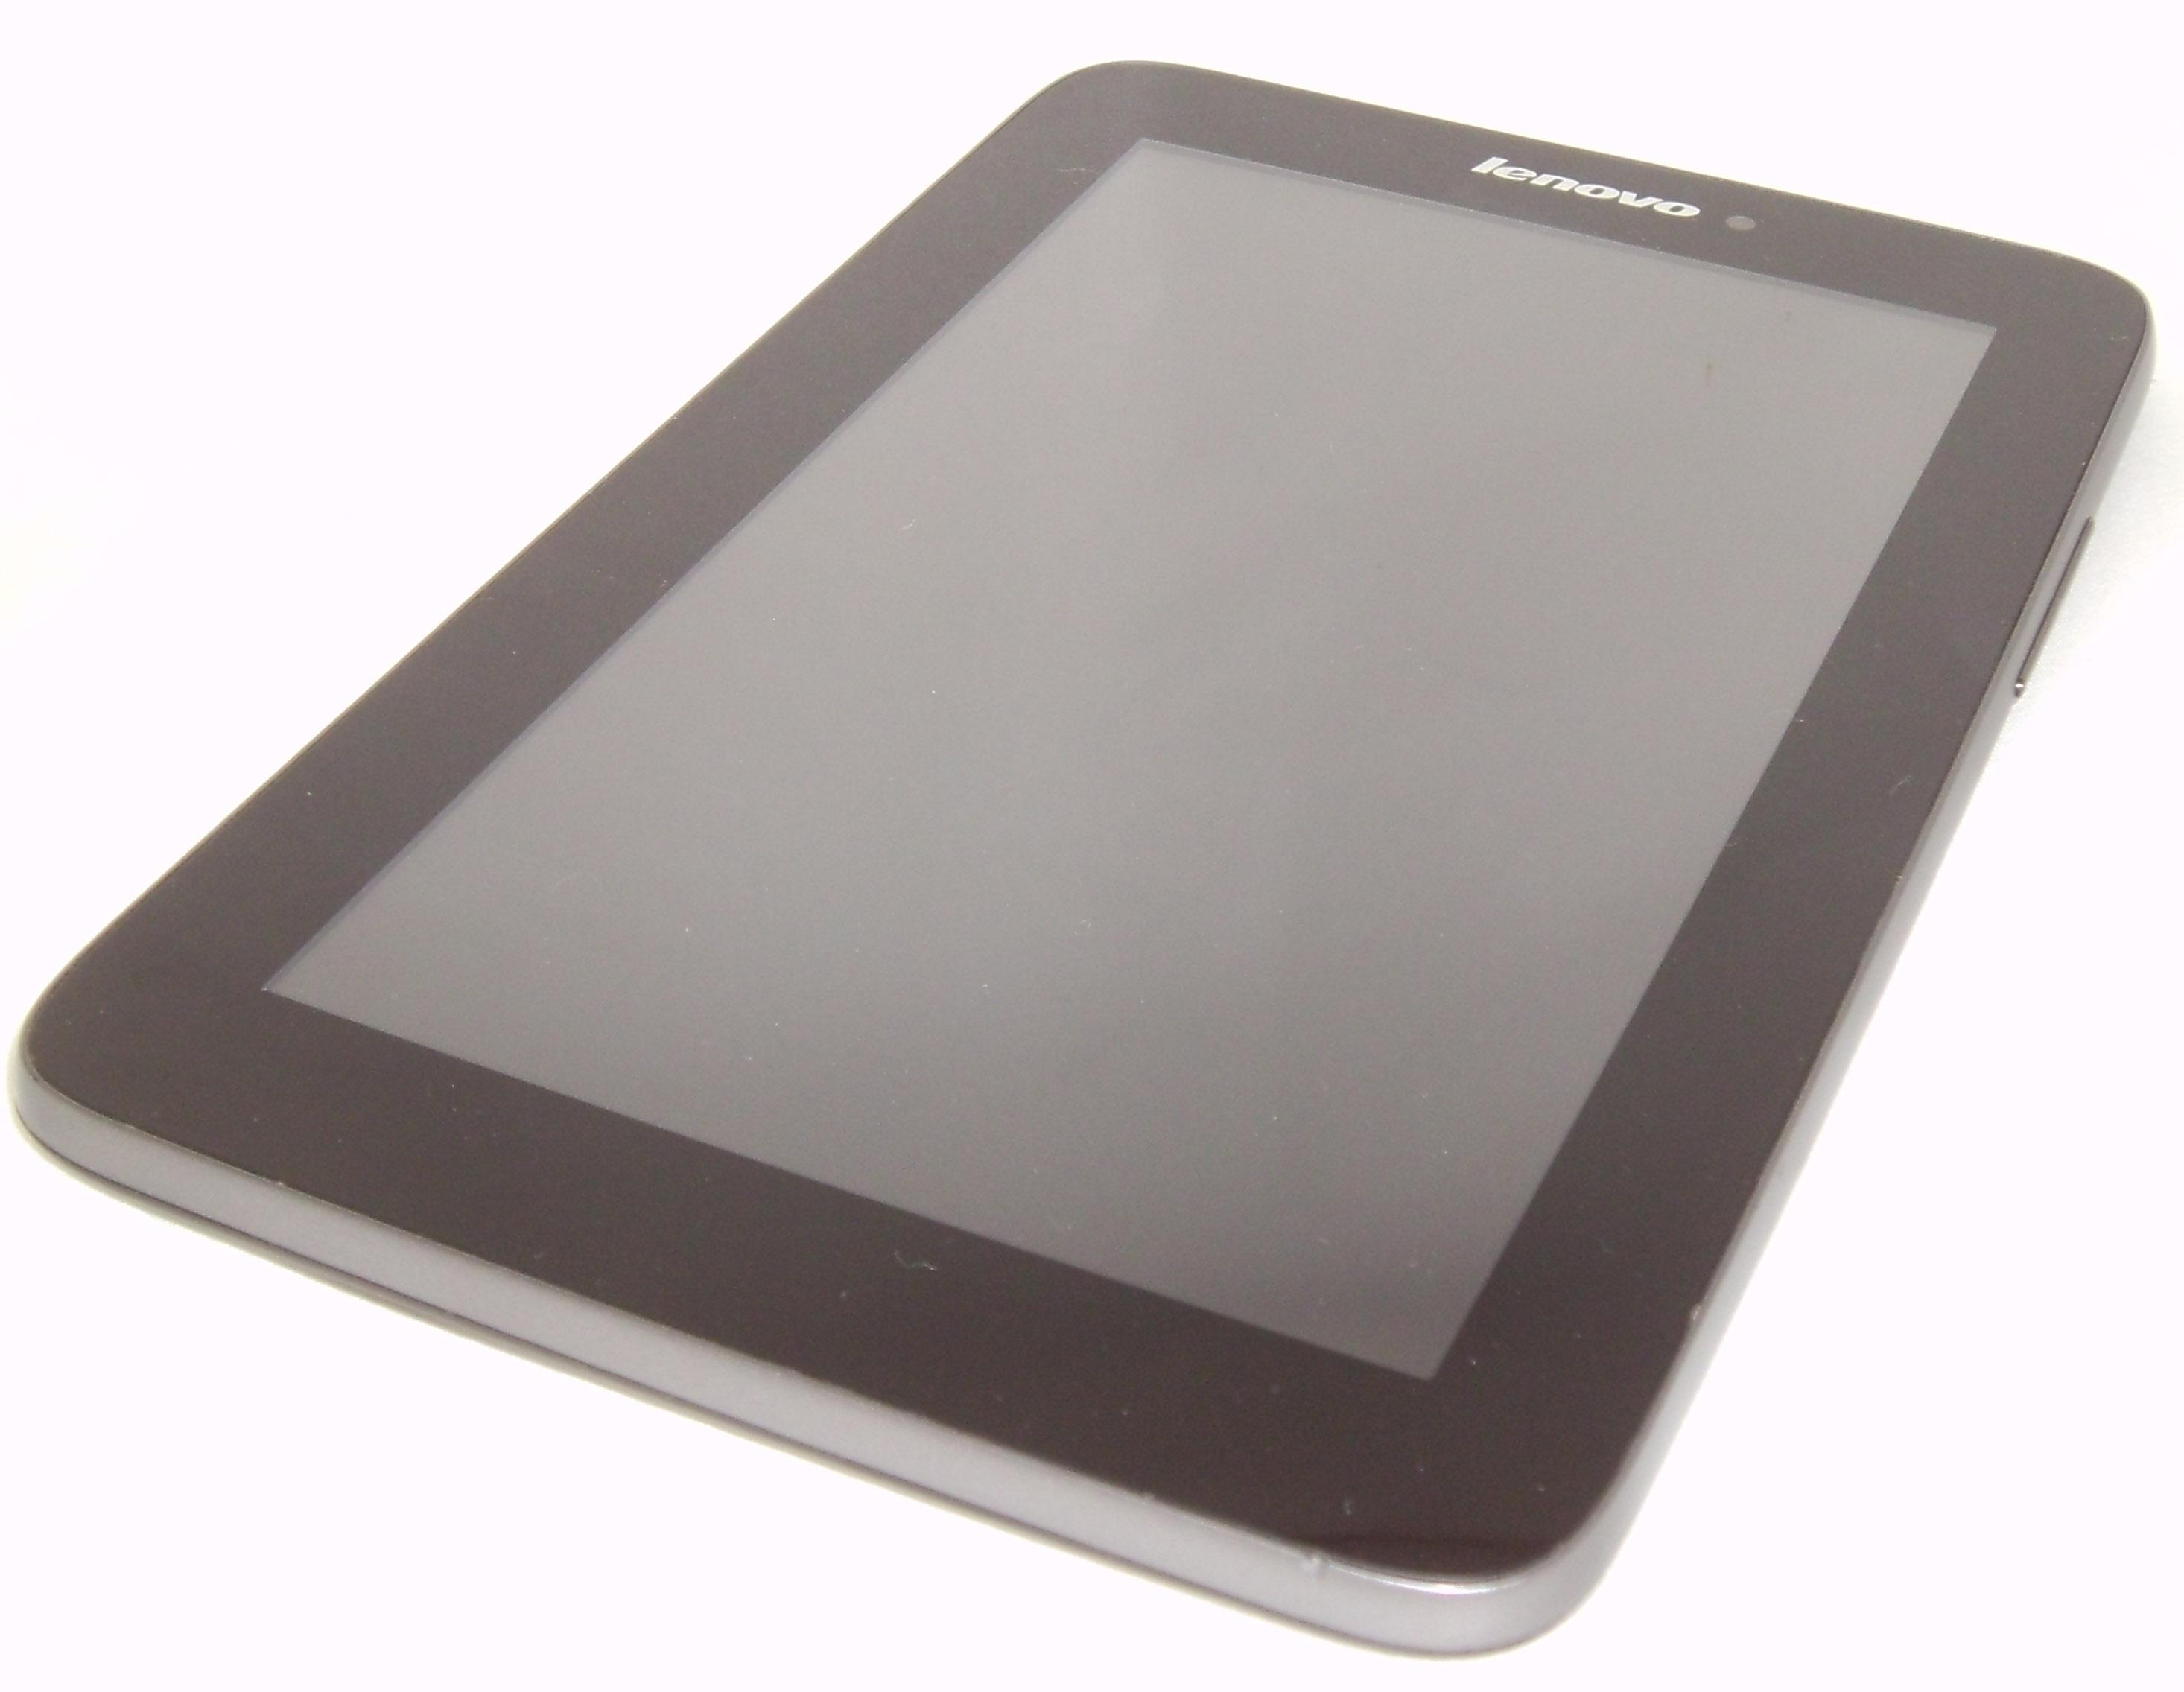 Bigger Screen Lenovo IdeaTab Android Tablet